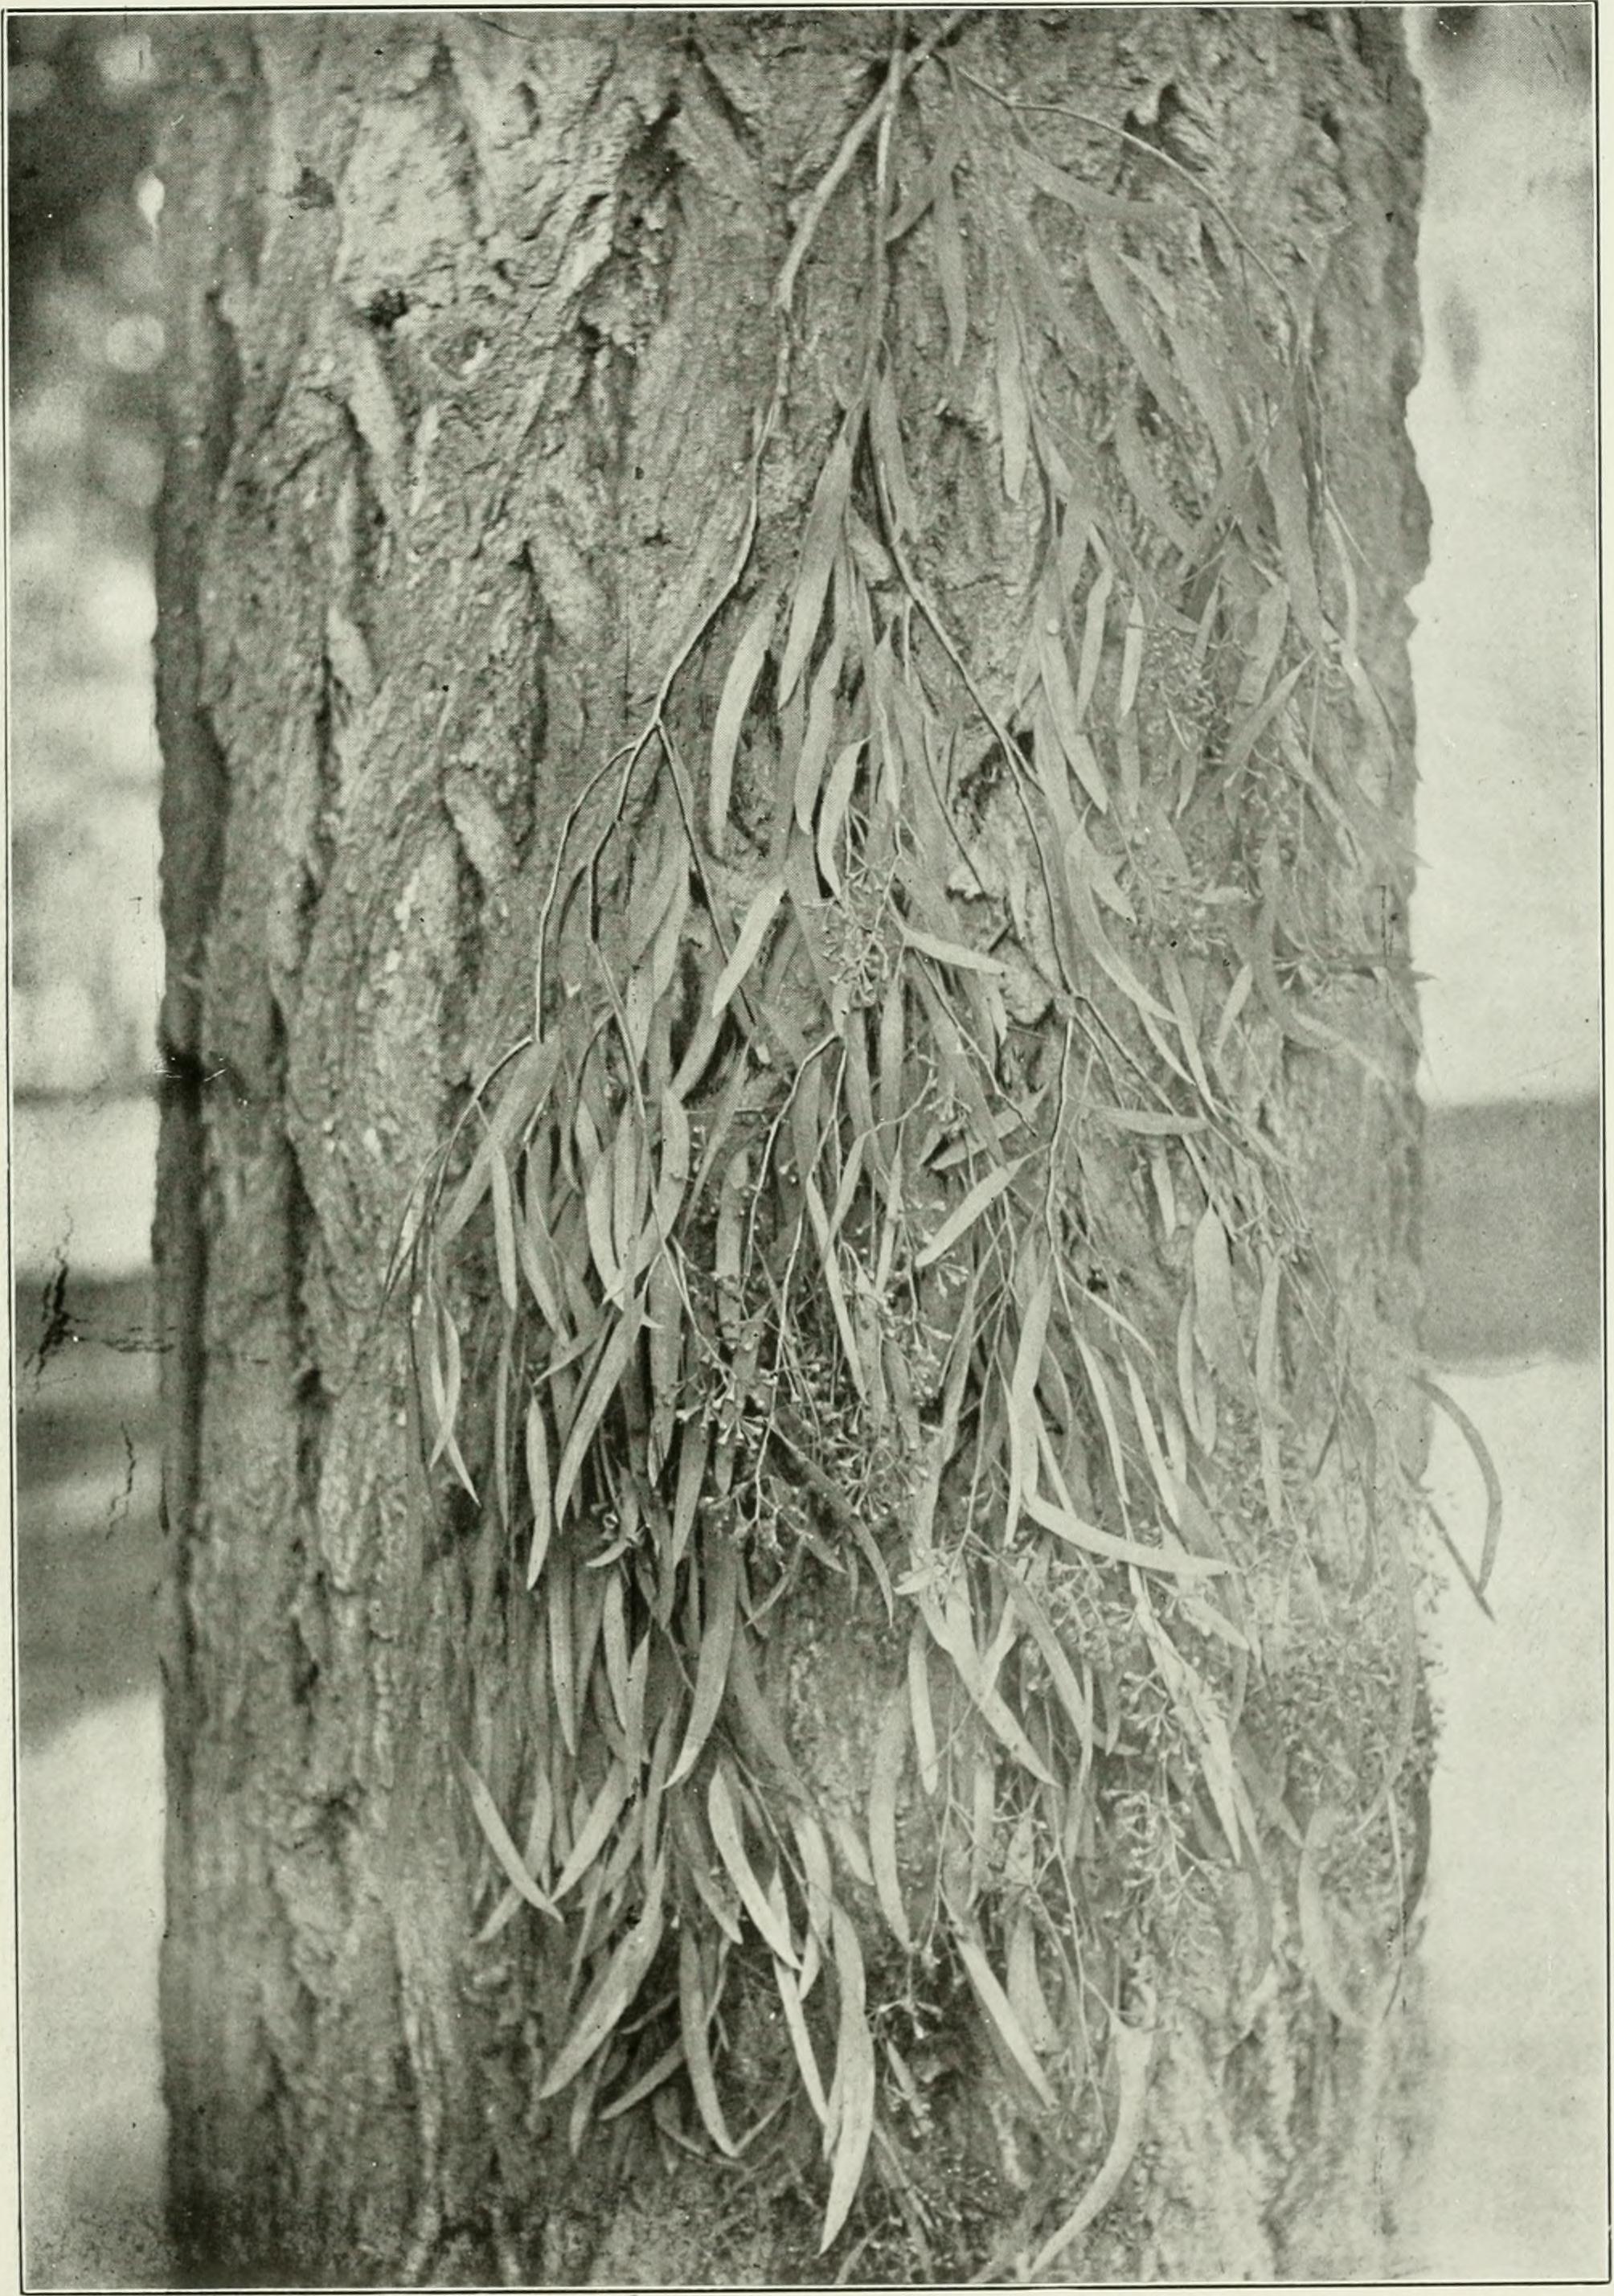 Image of narrowleaf red ironbark